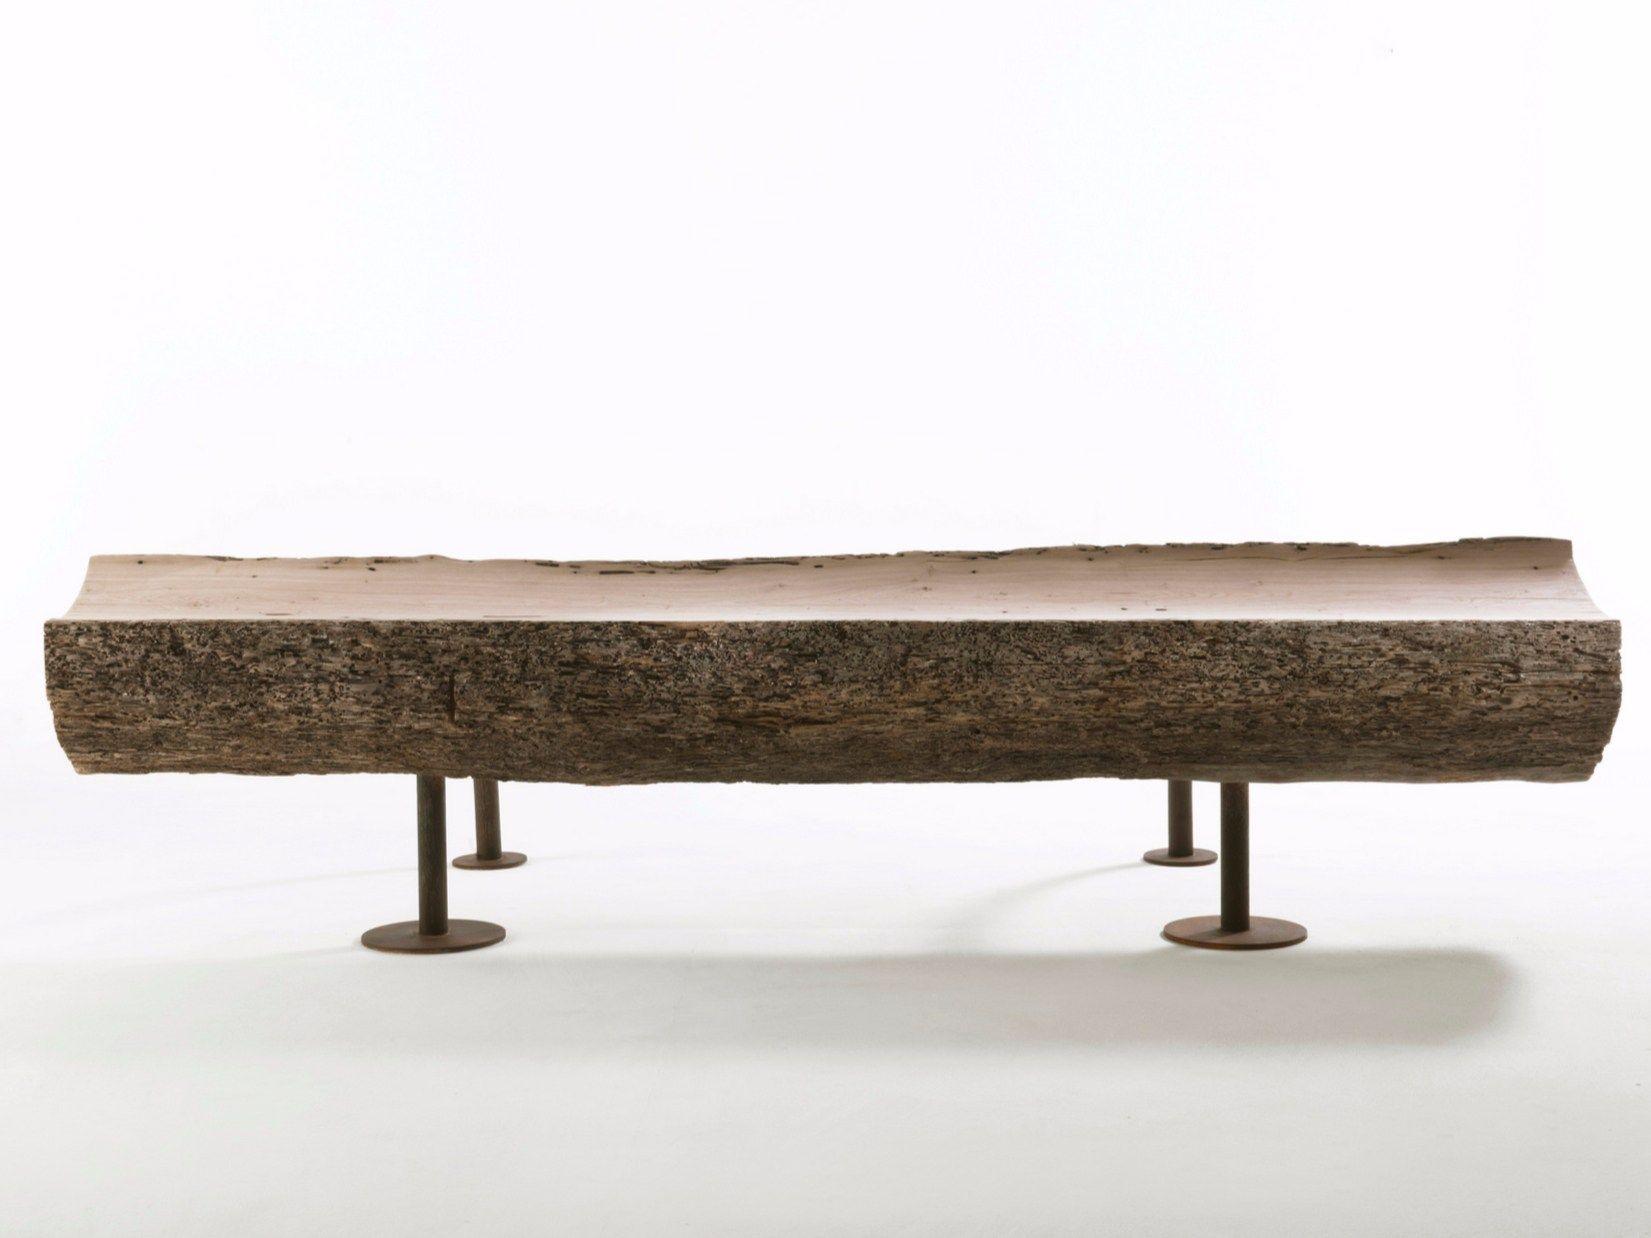 Wooden bench divan by riva 1920 design riccardo arbizzoni for Divan design